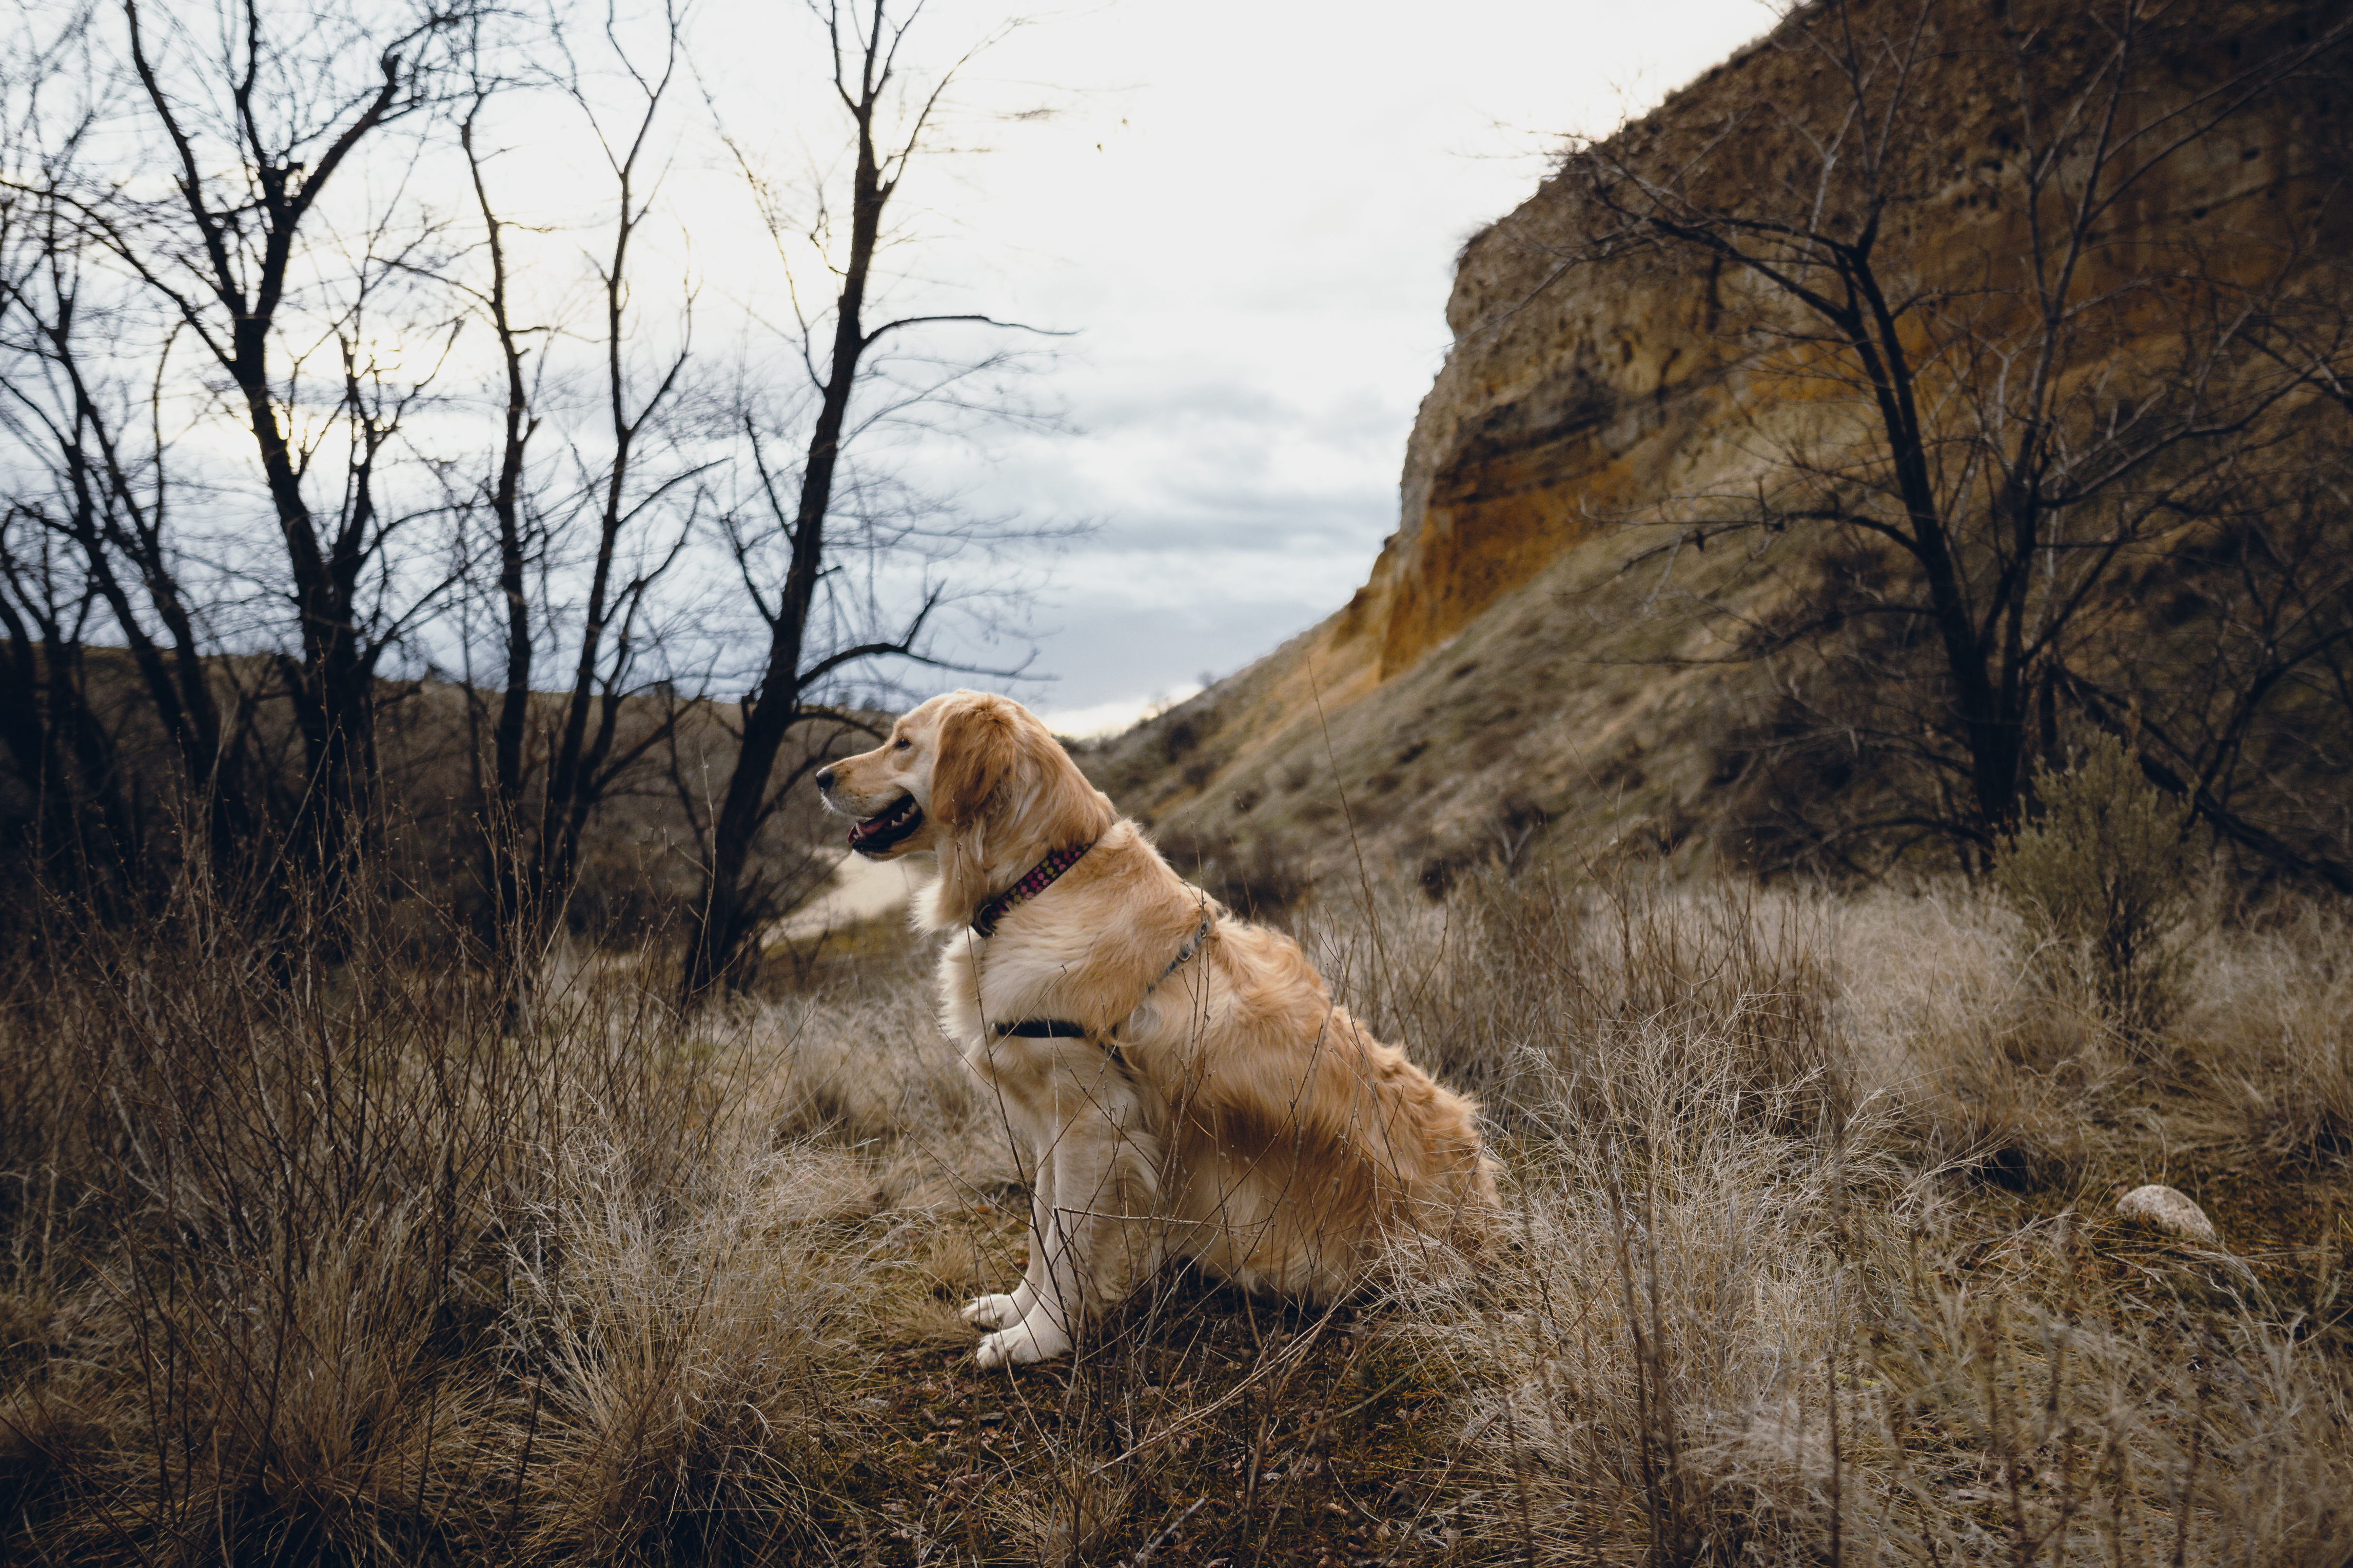 dog on a mountain trail